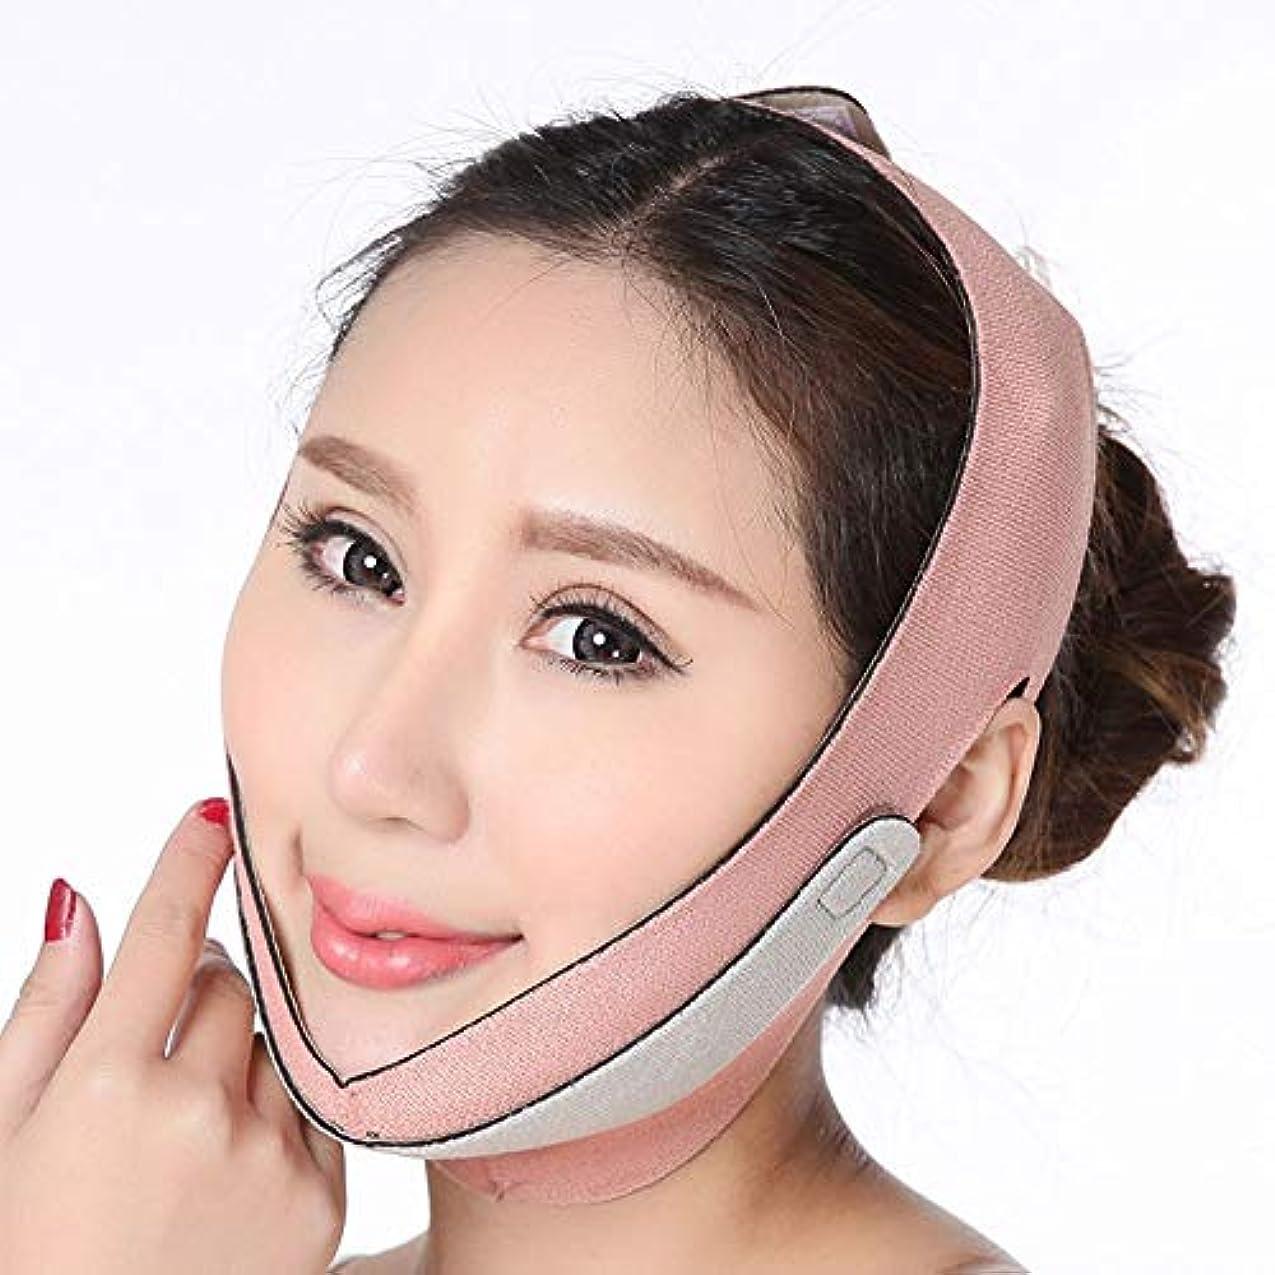 Jia Jia- シンフェイス包帯シンフェイスマスクフェイスリフトアーティファクトレイズVフェイスシンフェイスフェイスリフティング美容マスク小フェイス包帯 顔面包帯 (色 : A)